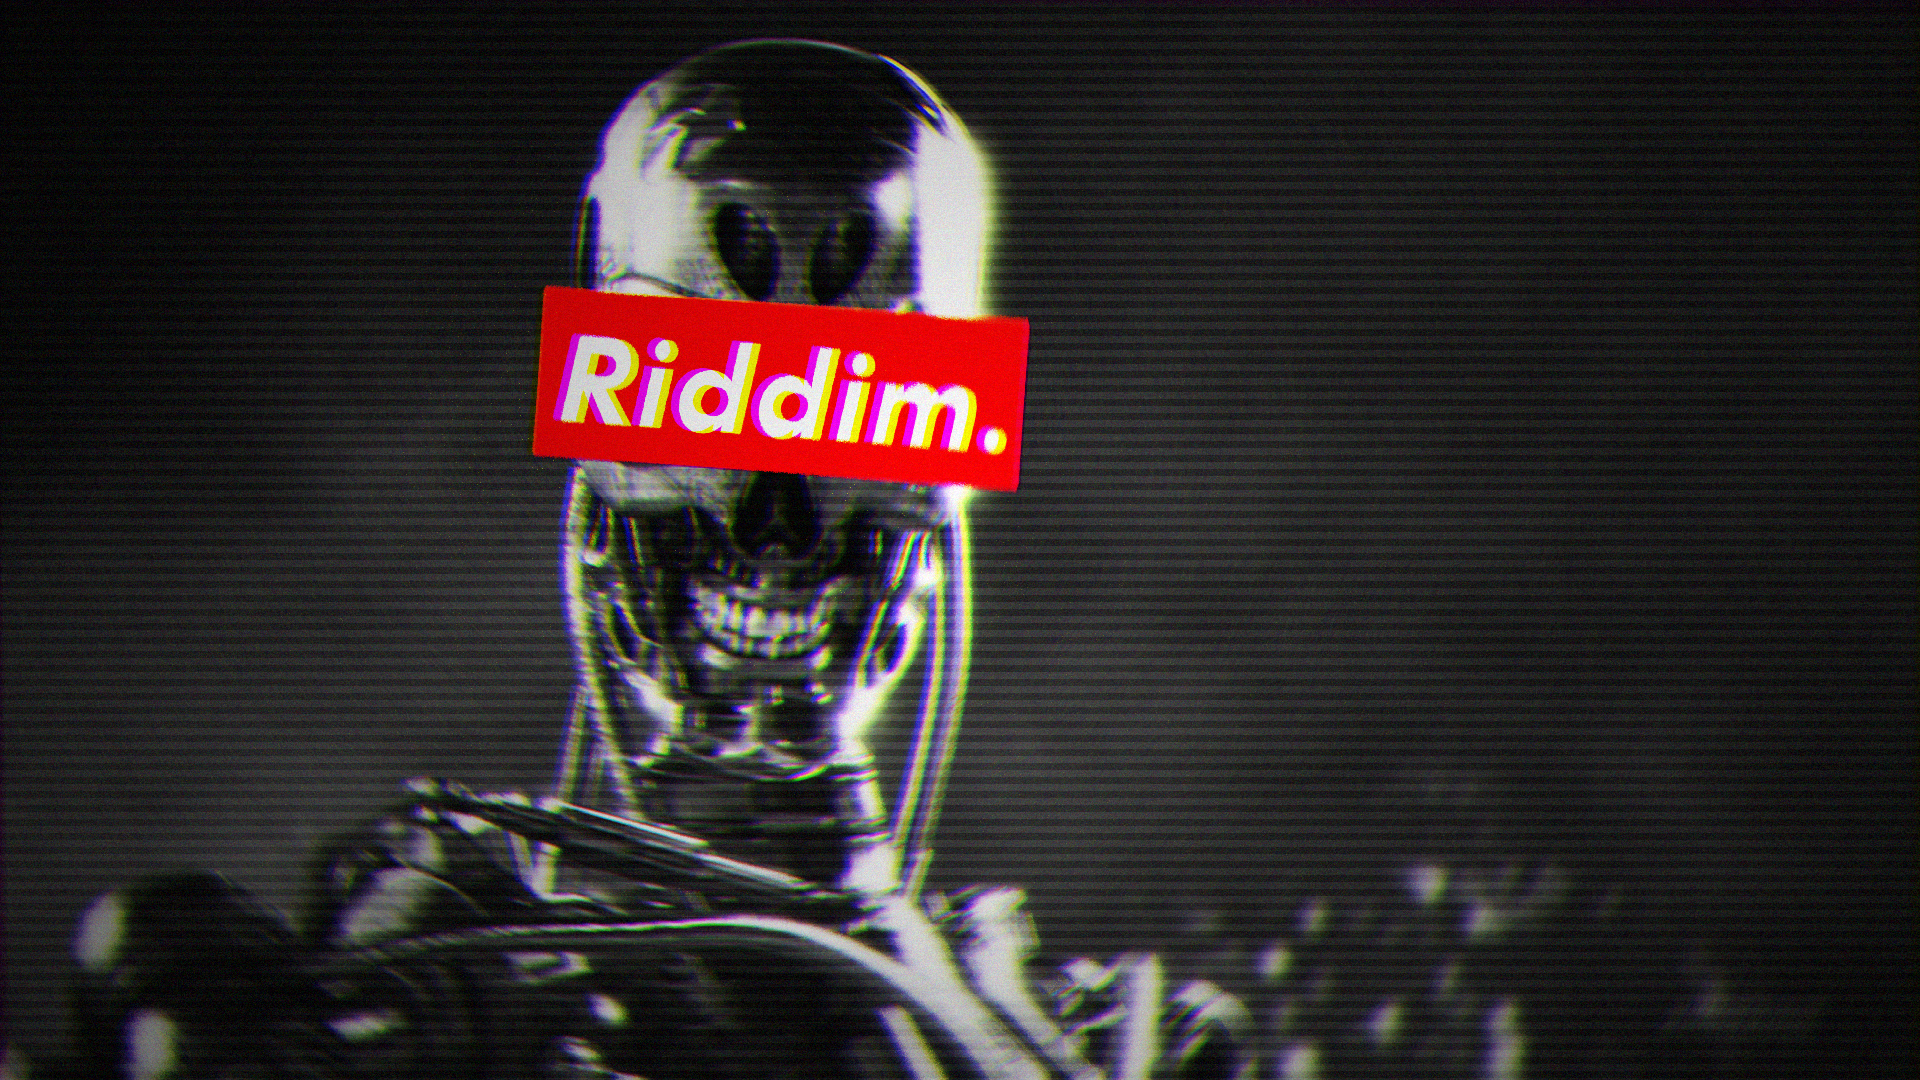 General 1920x1080 Riddim Dubstep dubstep glitch art VHS Terminator Terminator 2 Terminator 3: Rise of the Machines Terminator Genisys robot artwork simple